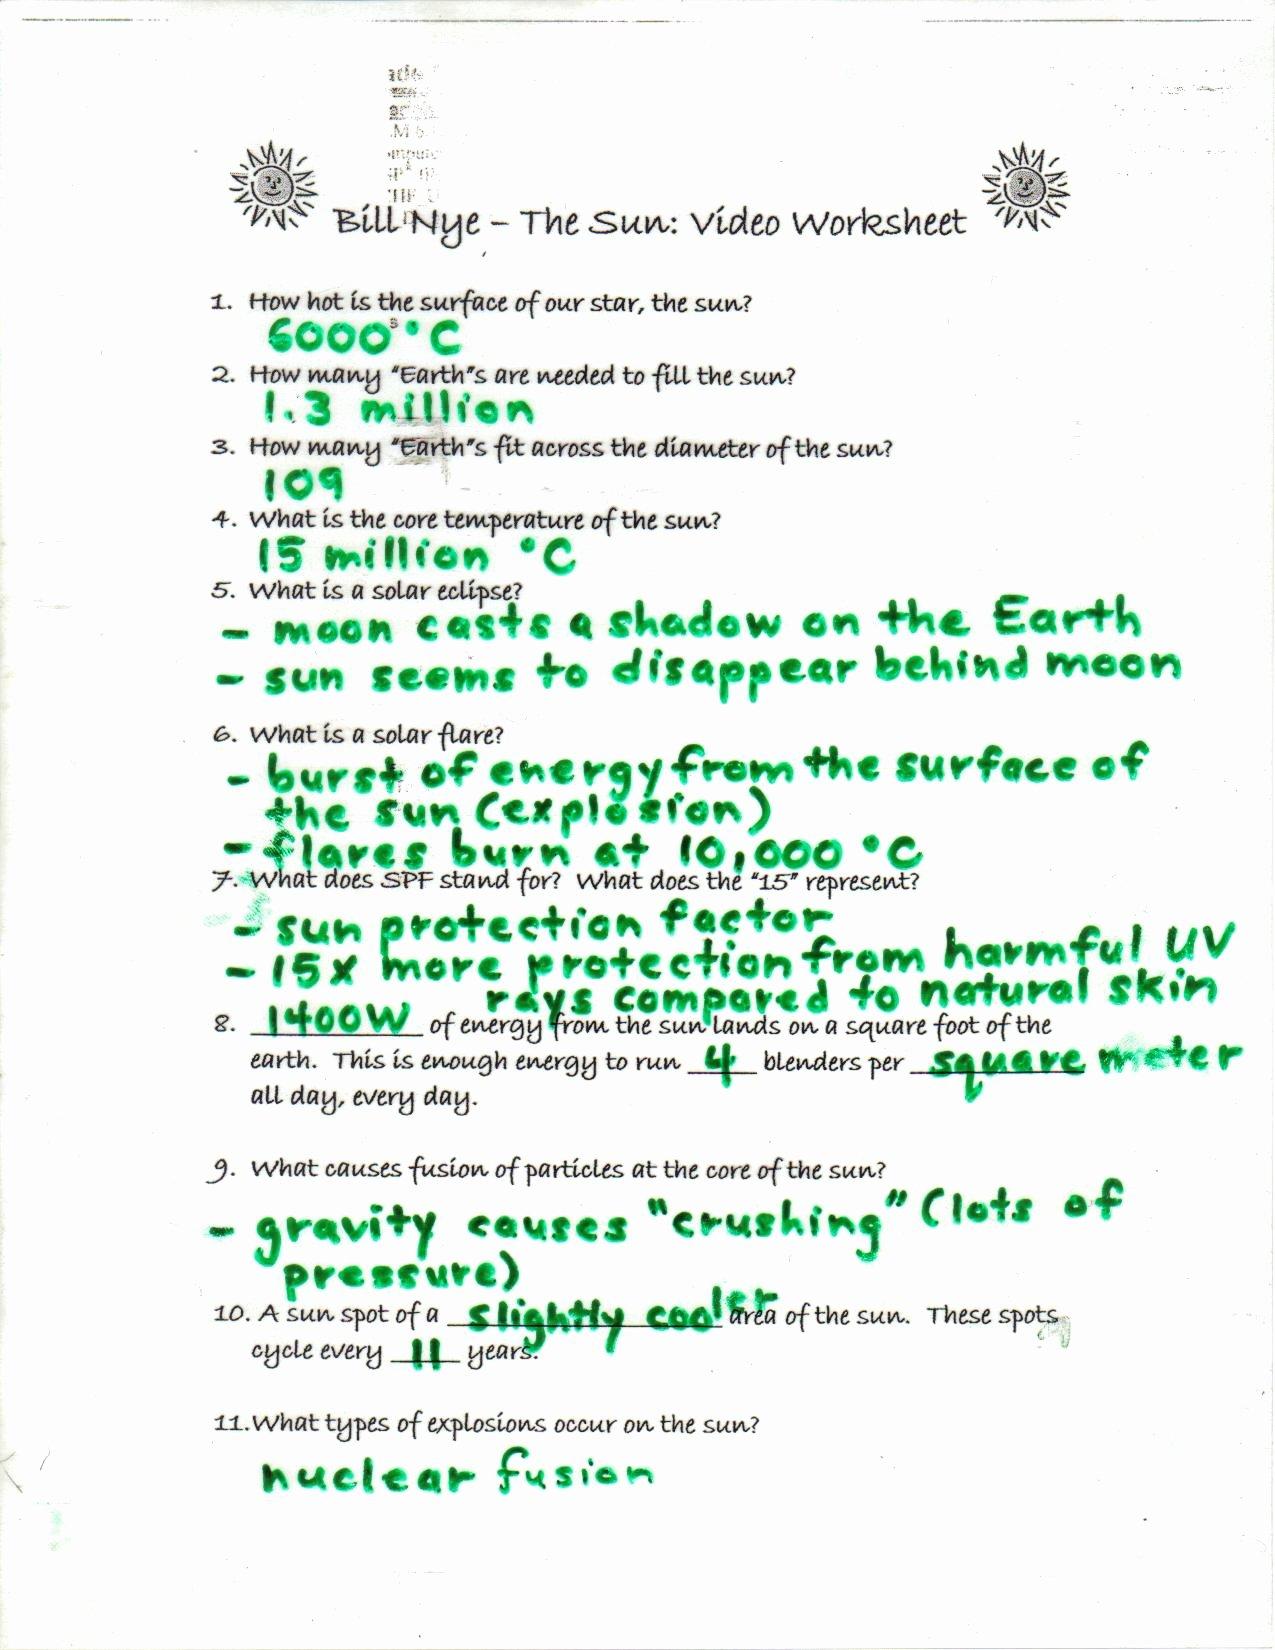 Bill Nye Motion Worksheet Answers New Bill Nye the Science Guy Earths Seasons Video Worksheet